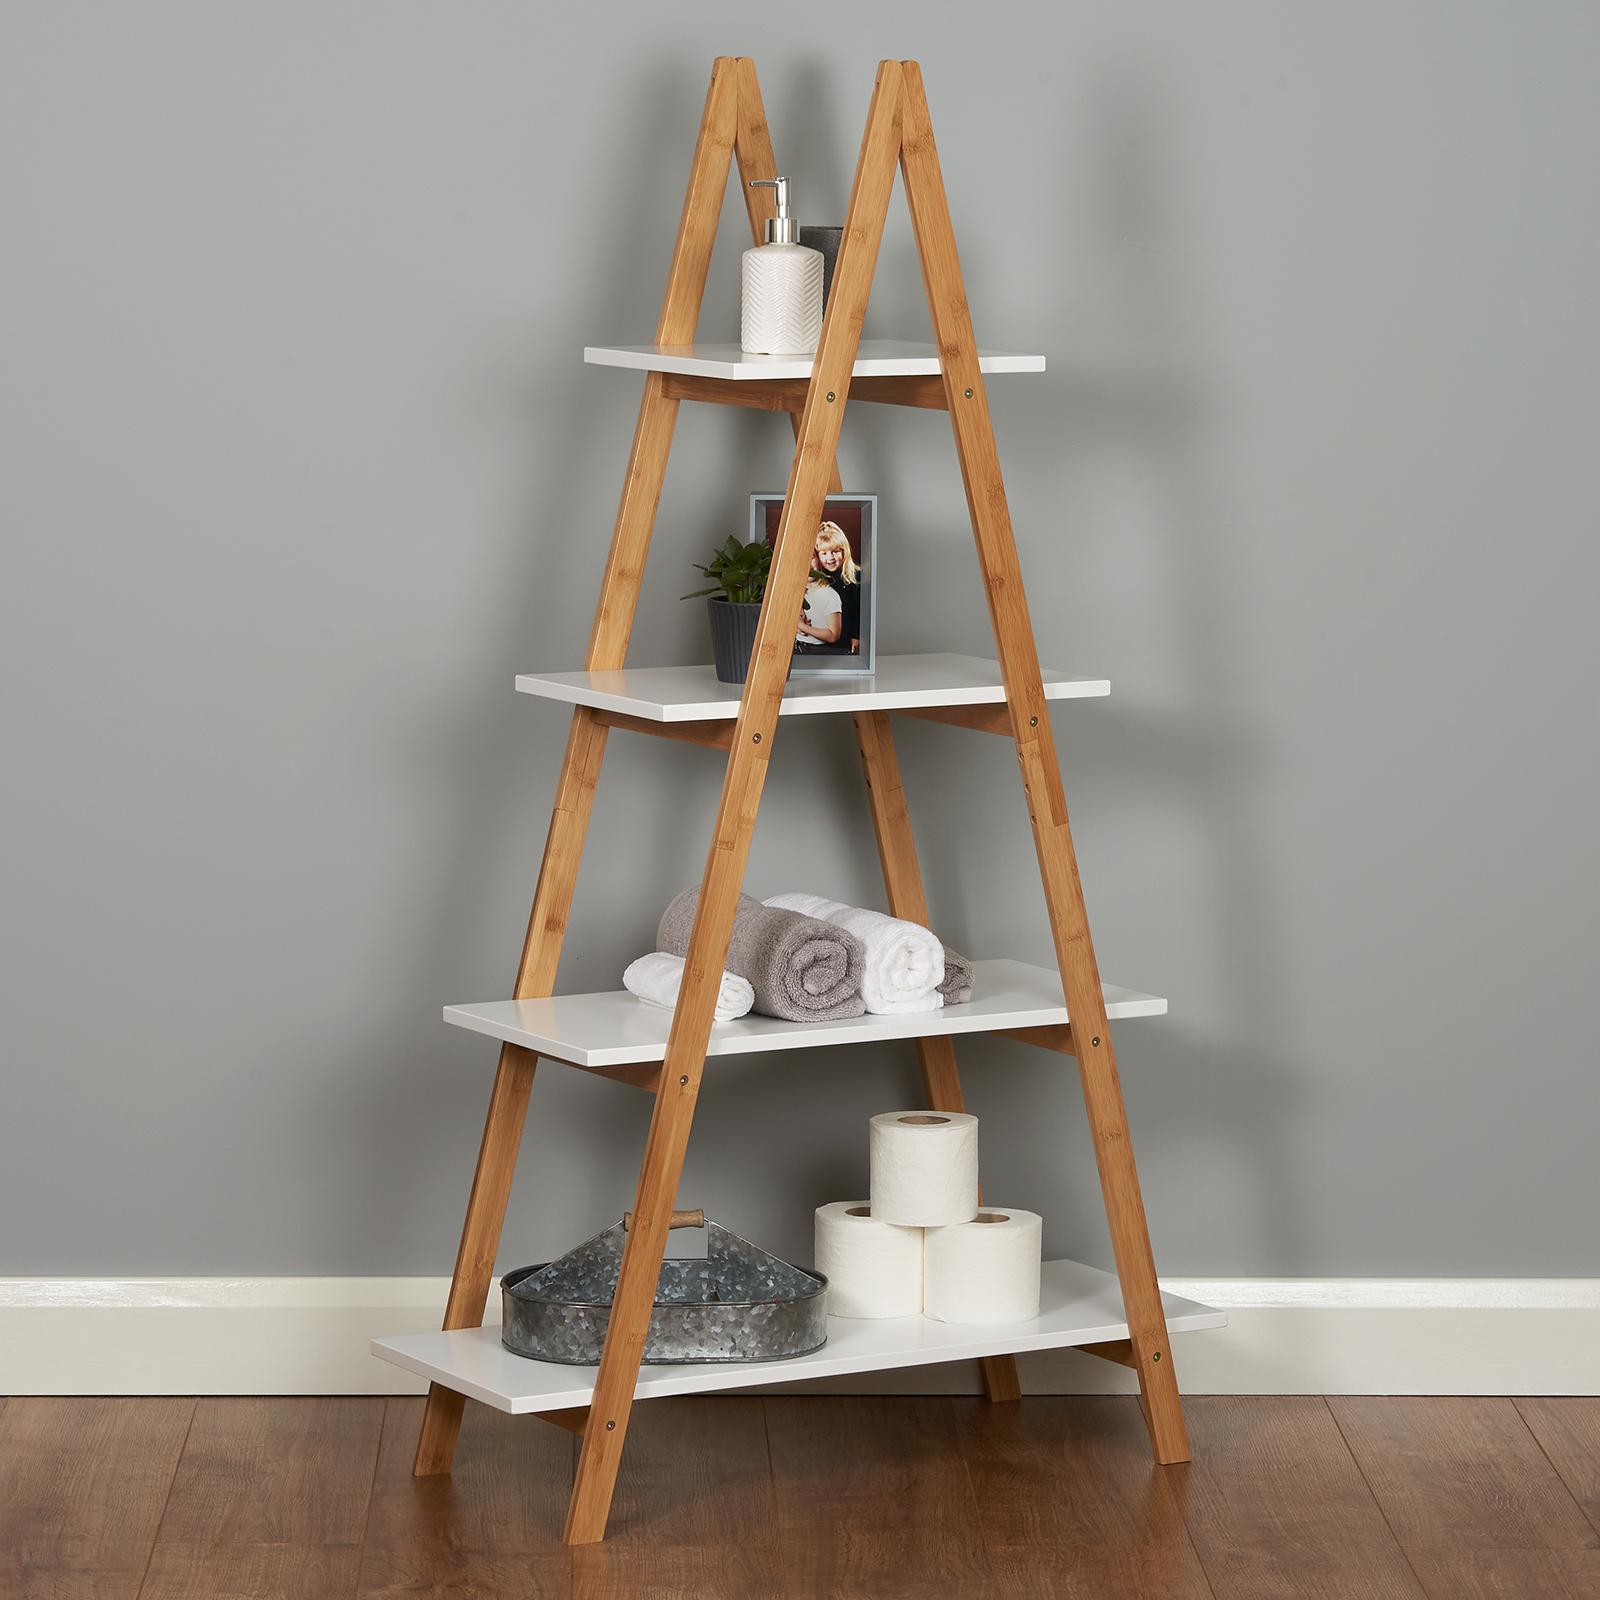 Roost White Ladder Bookshelf Shelf Unit Bamboo Bookcase Bathroom Storage Display 5051990952706 Ebay